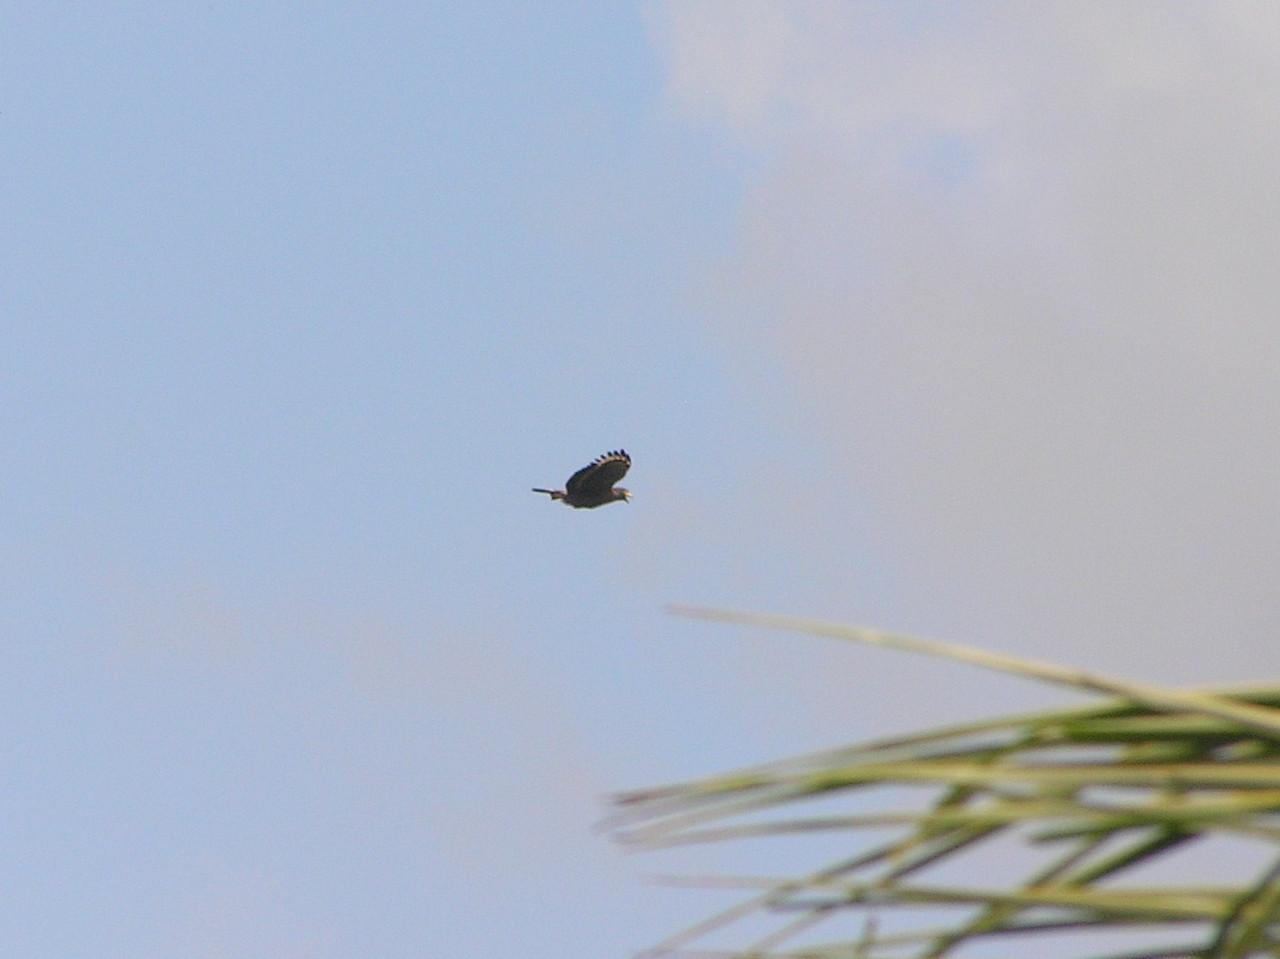 dunno eagle flight 6 bali aug 2010